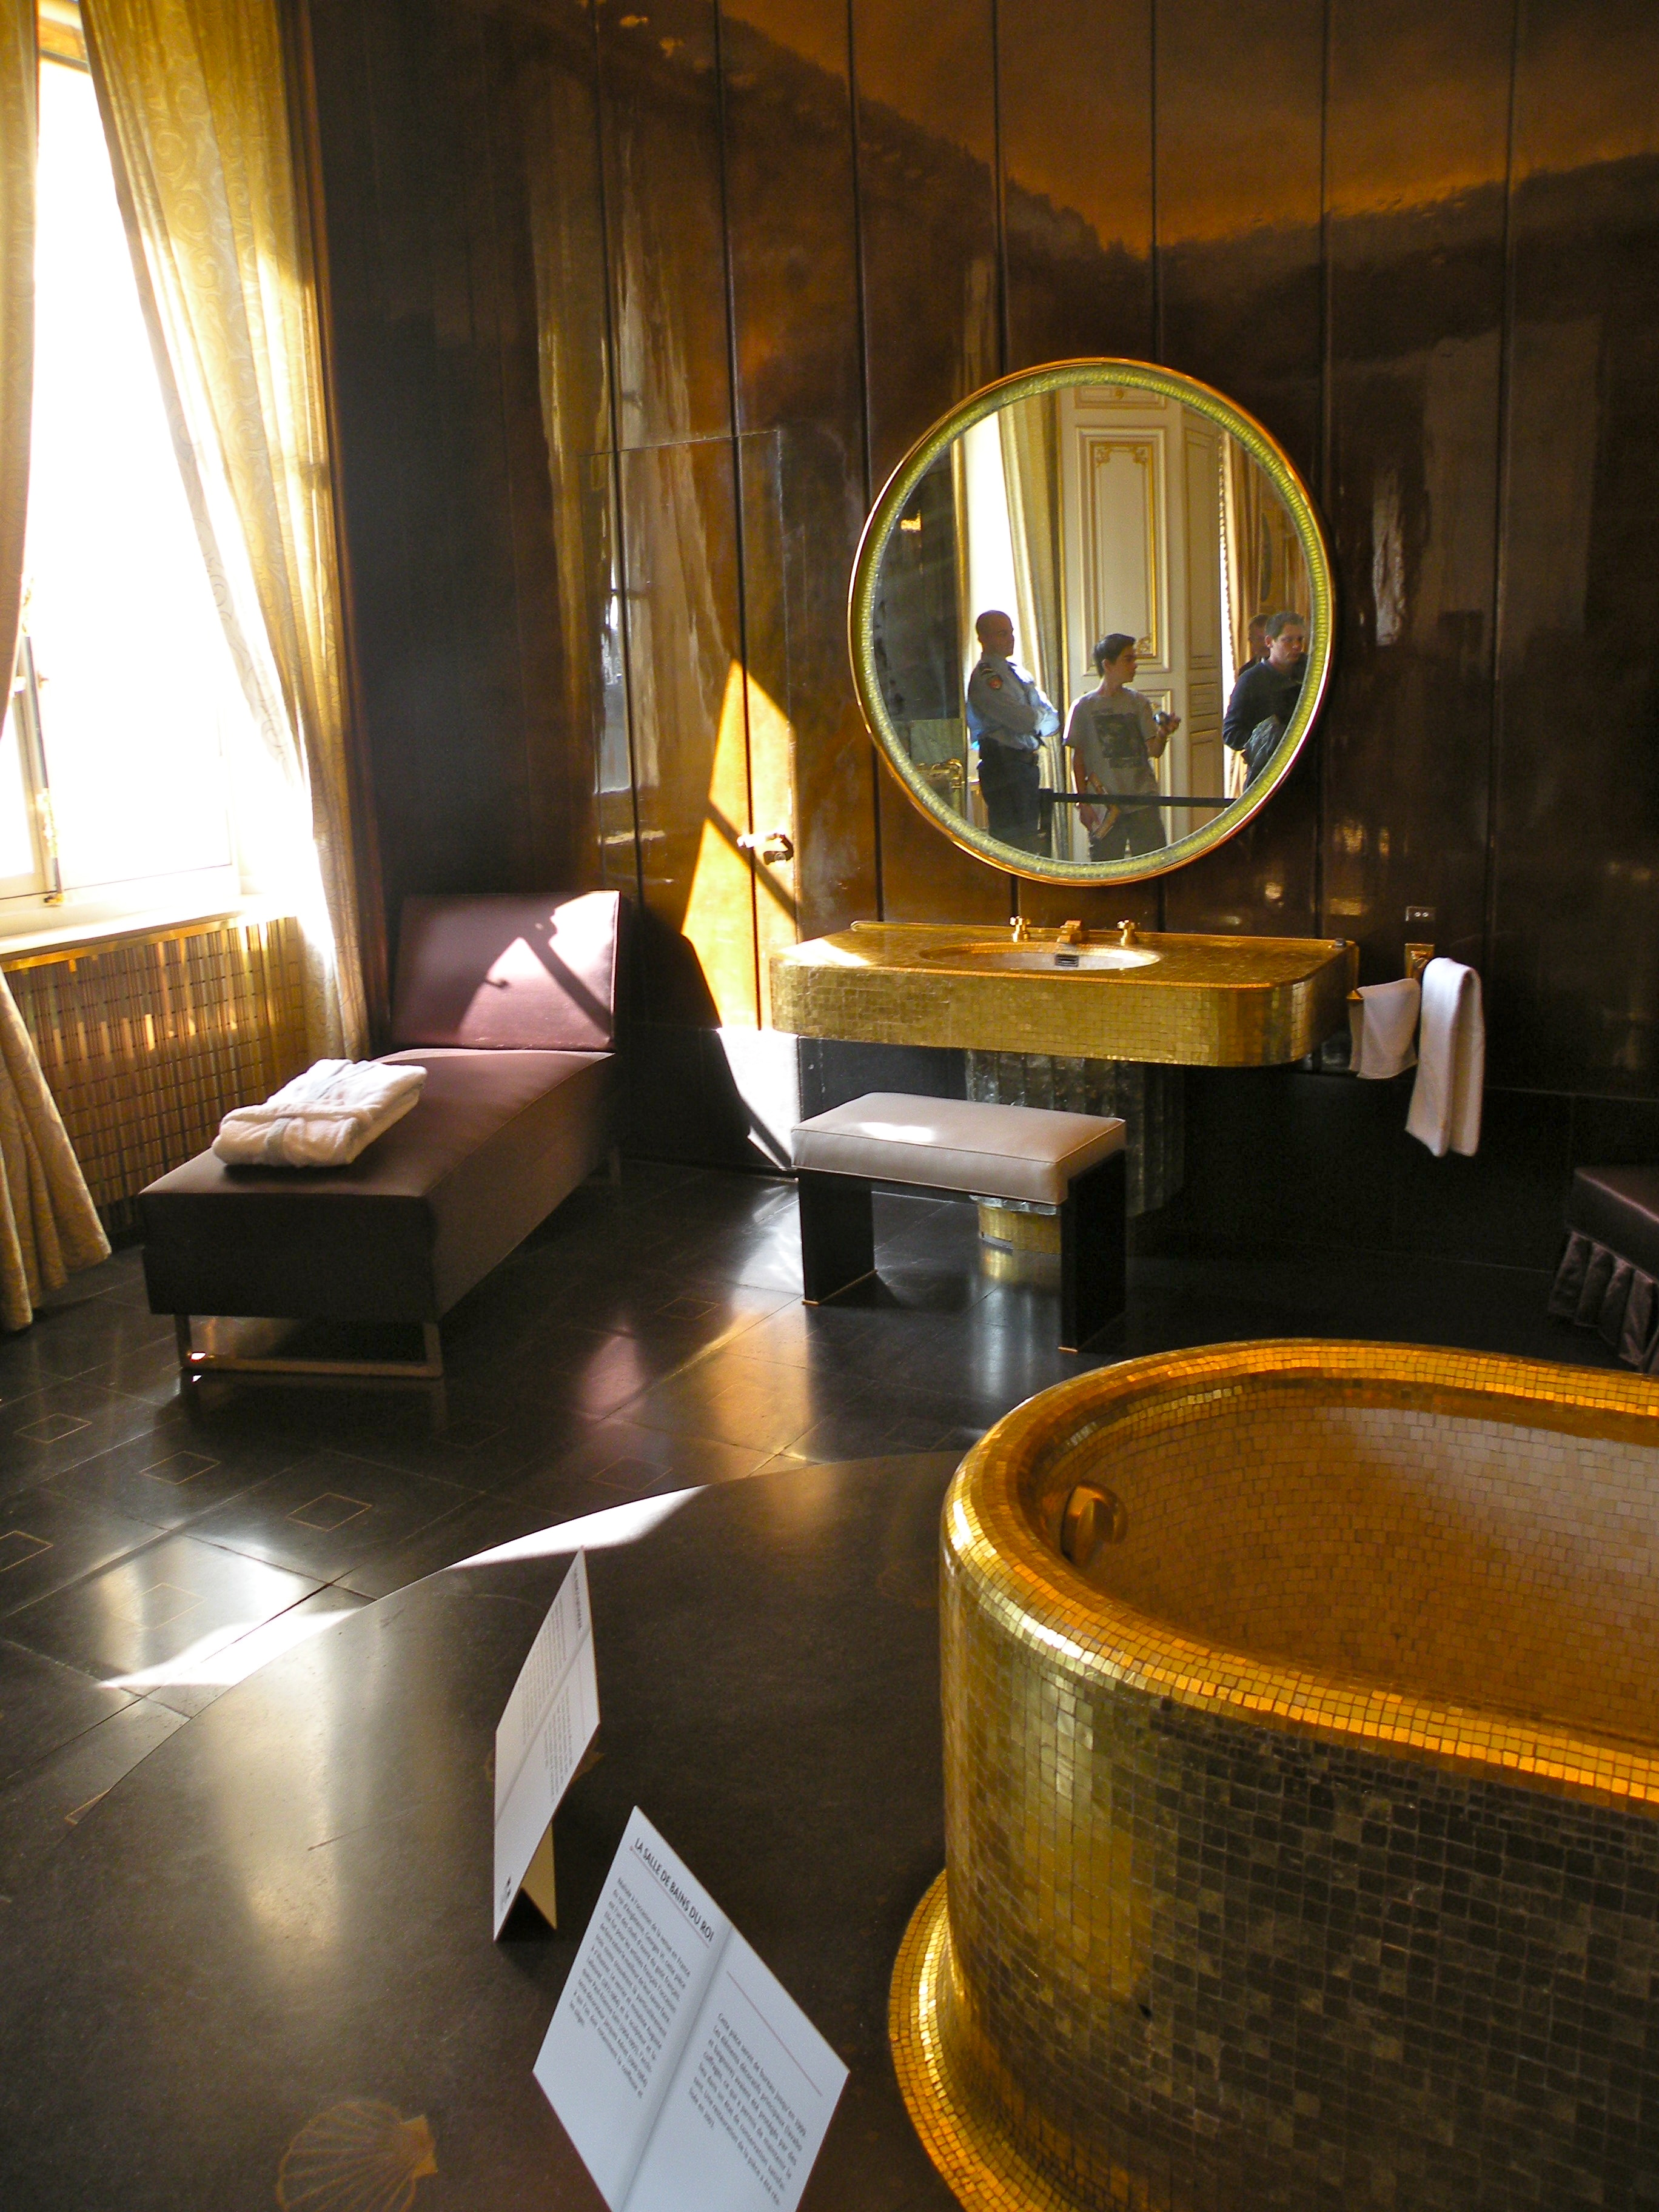 file 37 quai d orsay salle de bain du roi wikimedia mons